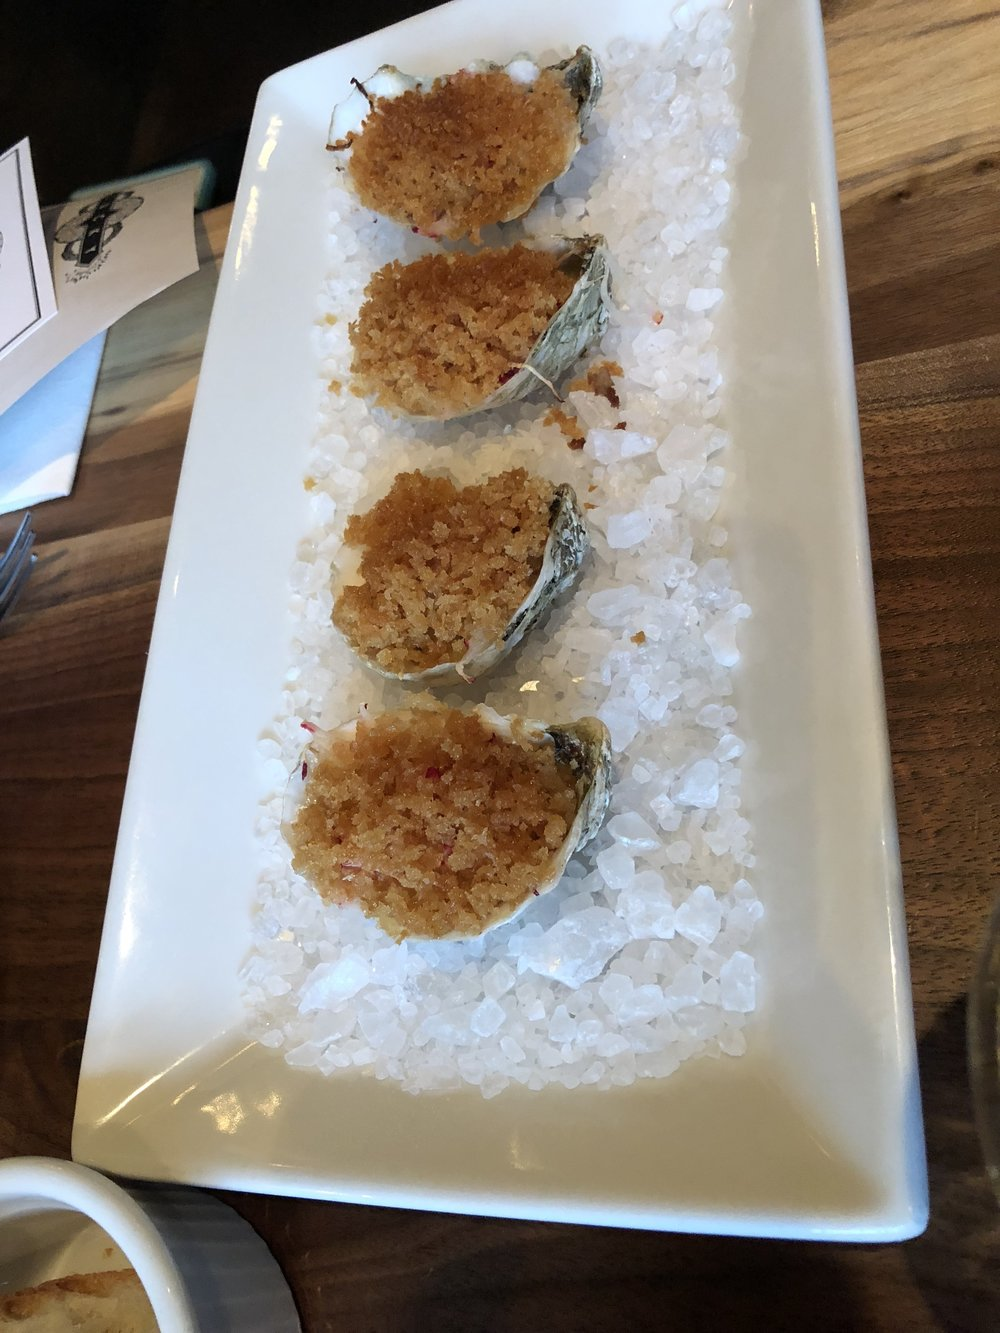 Oysters Rockefeller at Lucky's Roanoke